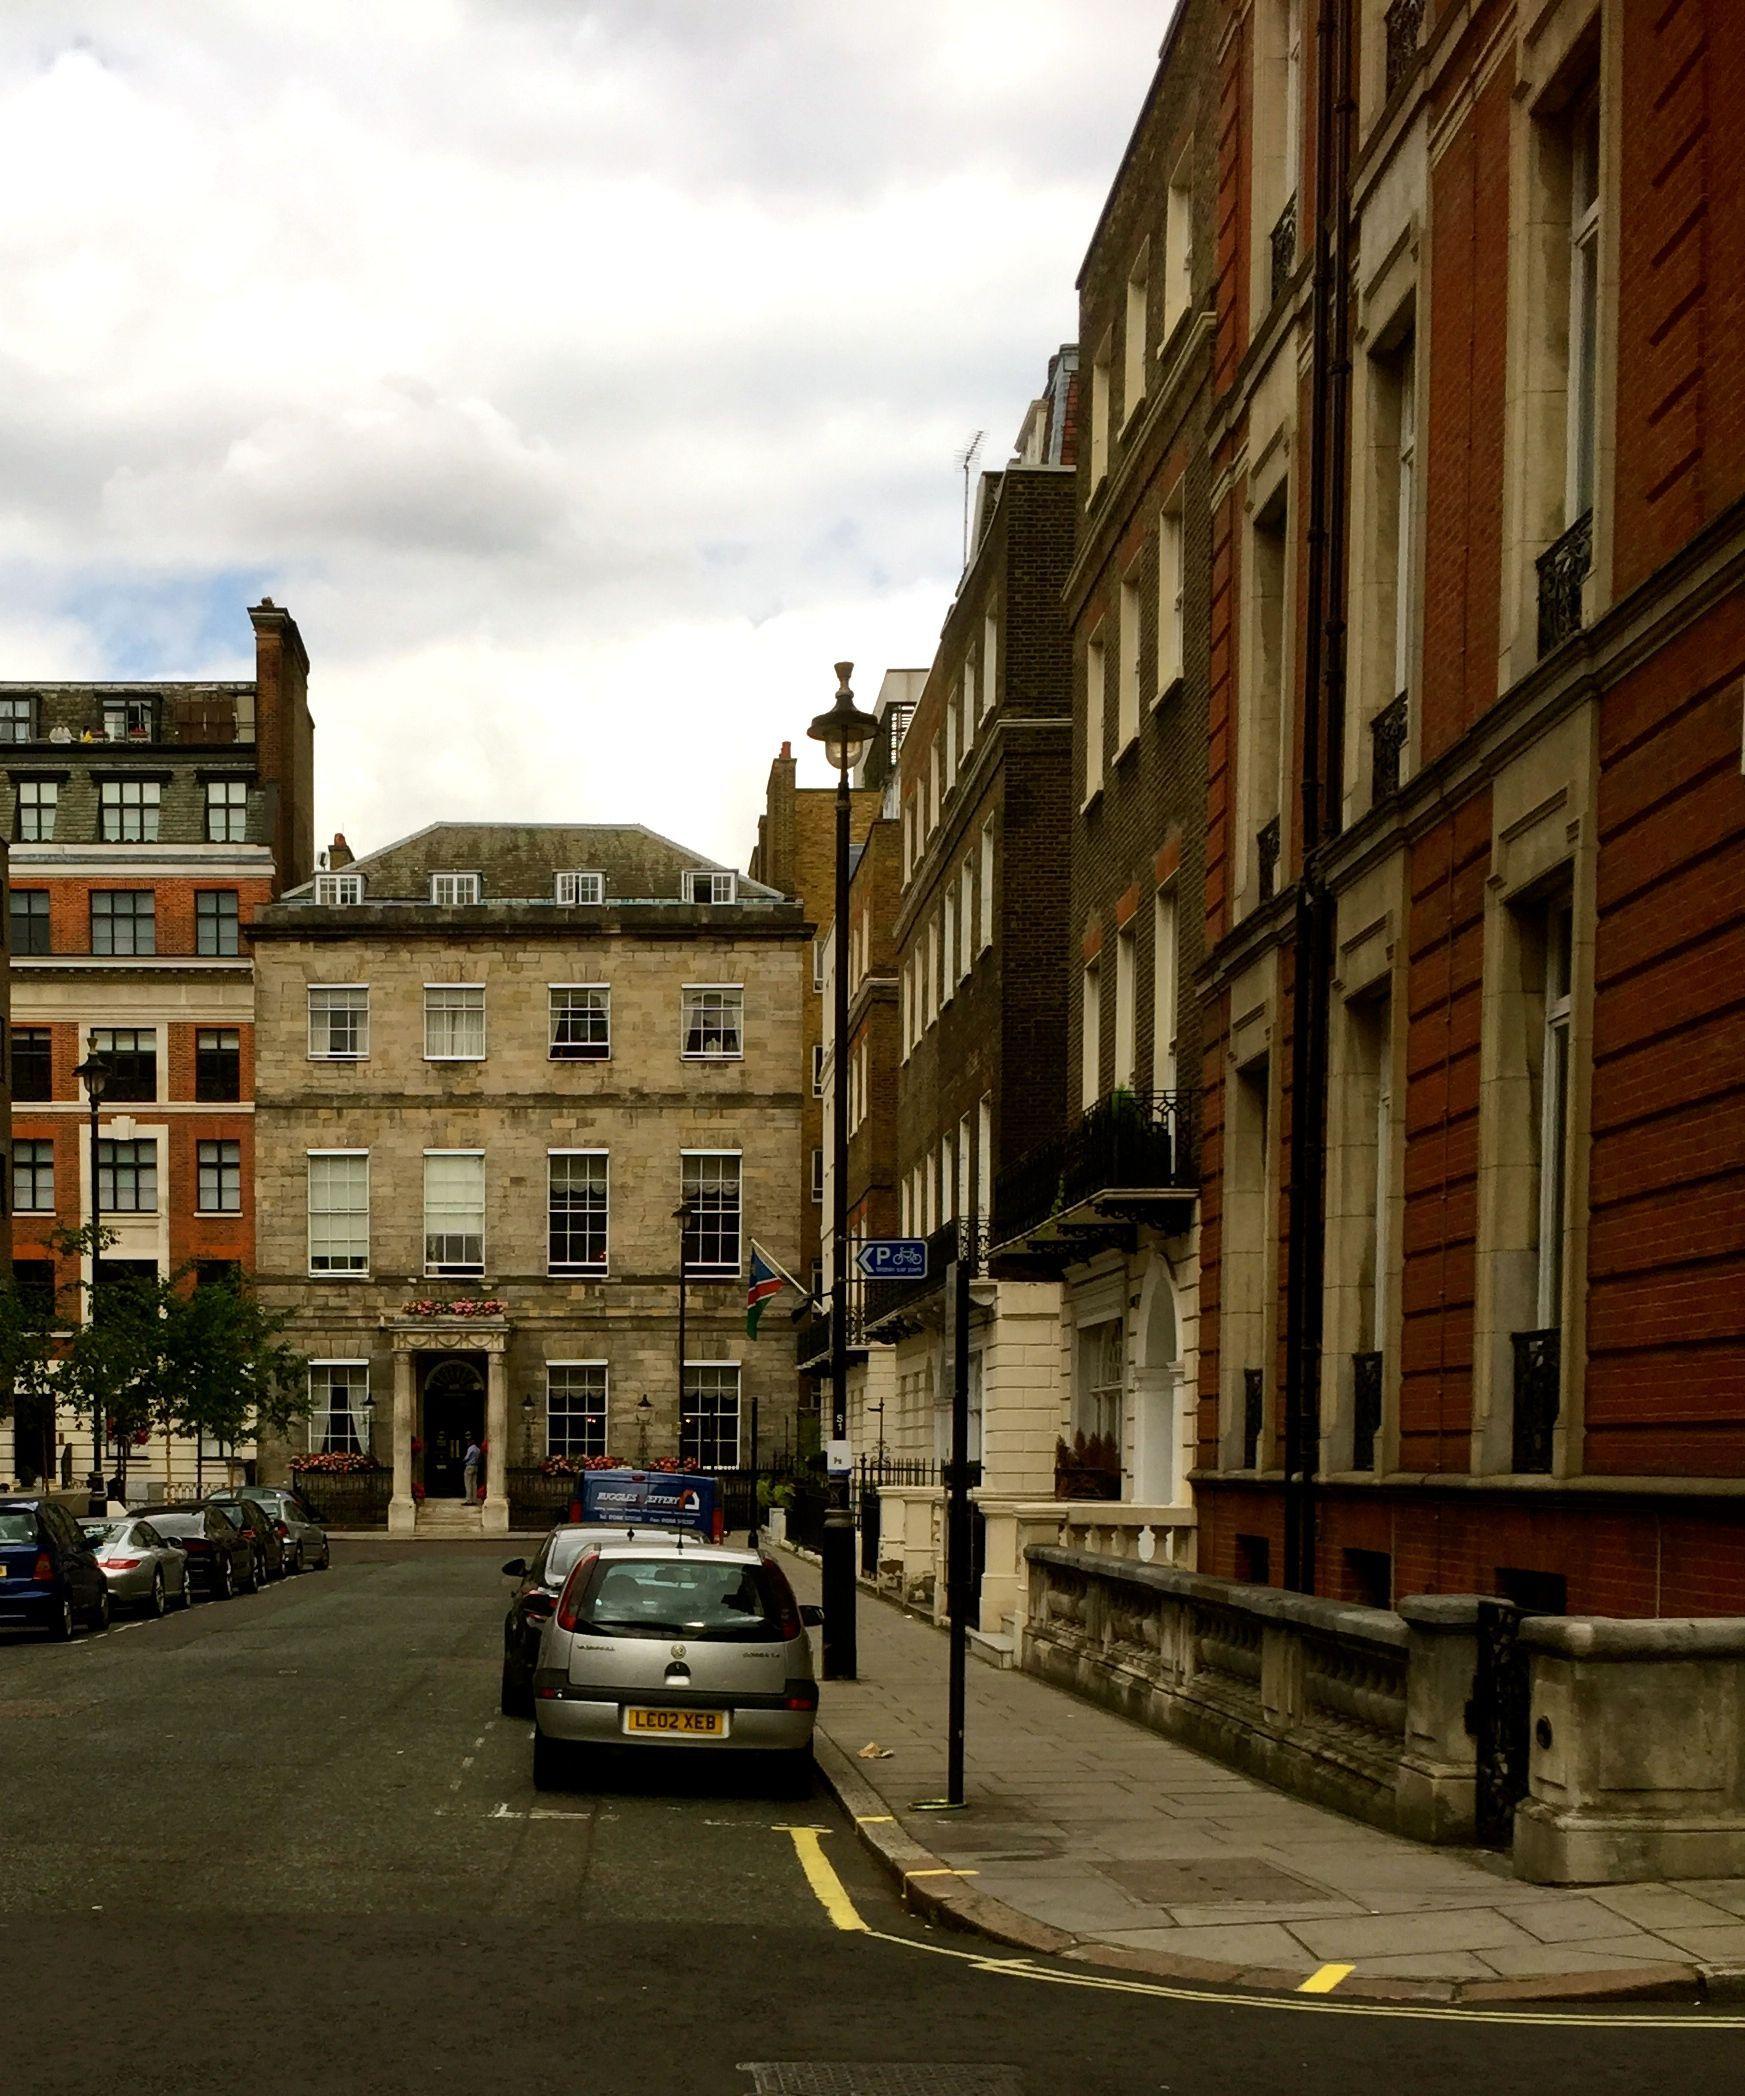 Around the corner - The Langham